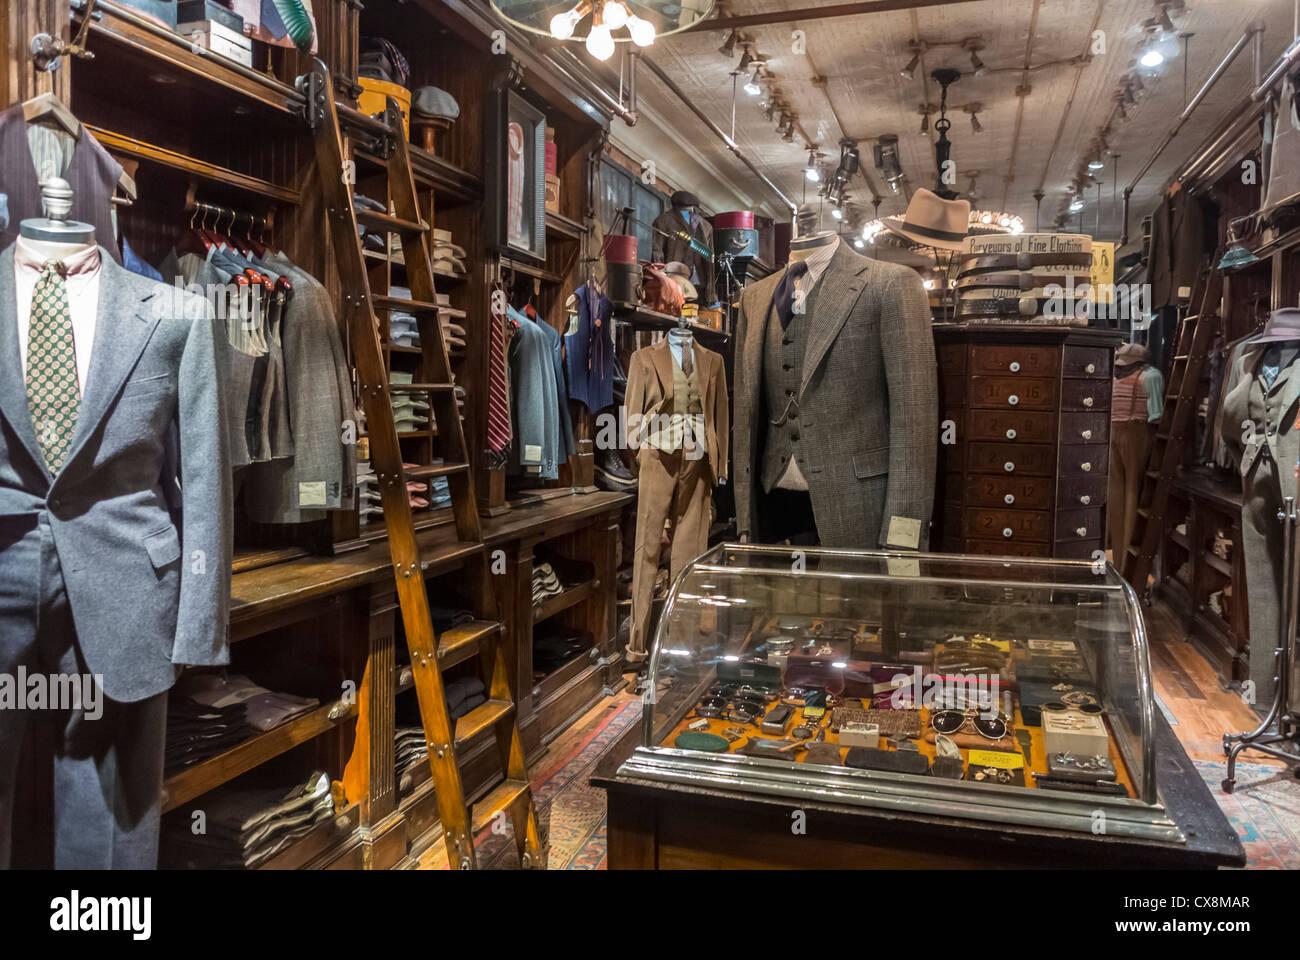 New York, NY, USA, Inside Luxury Men's Clothing Store at Night, Ralph Lauren, Display, Shelves - Stock Image